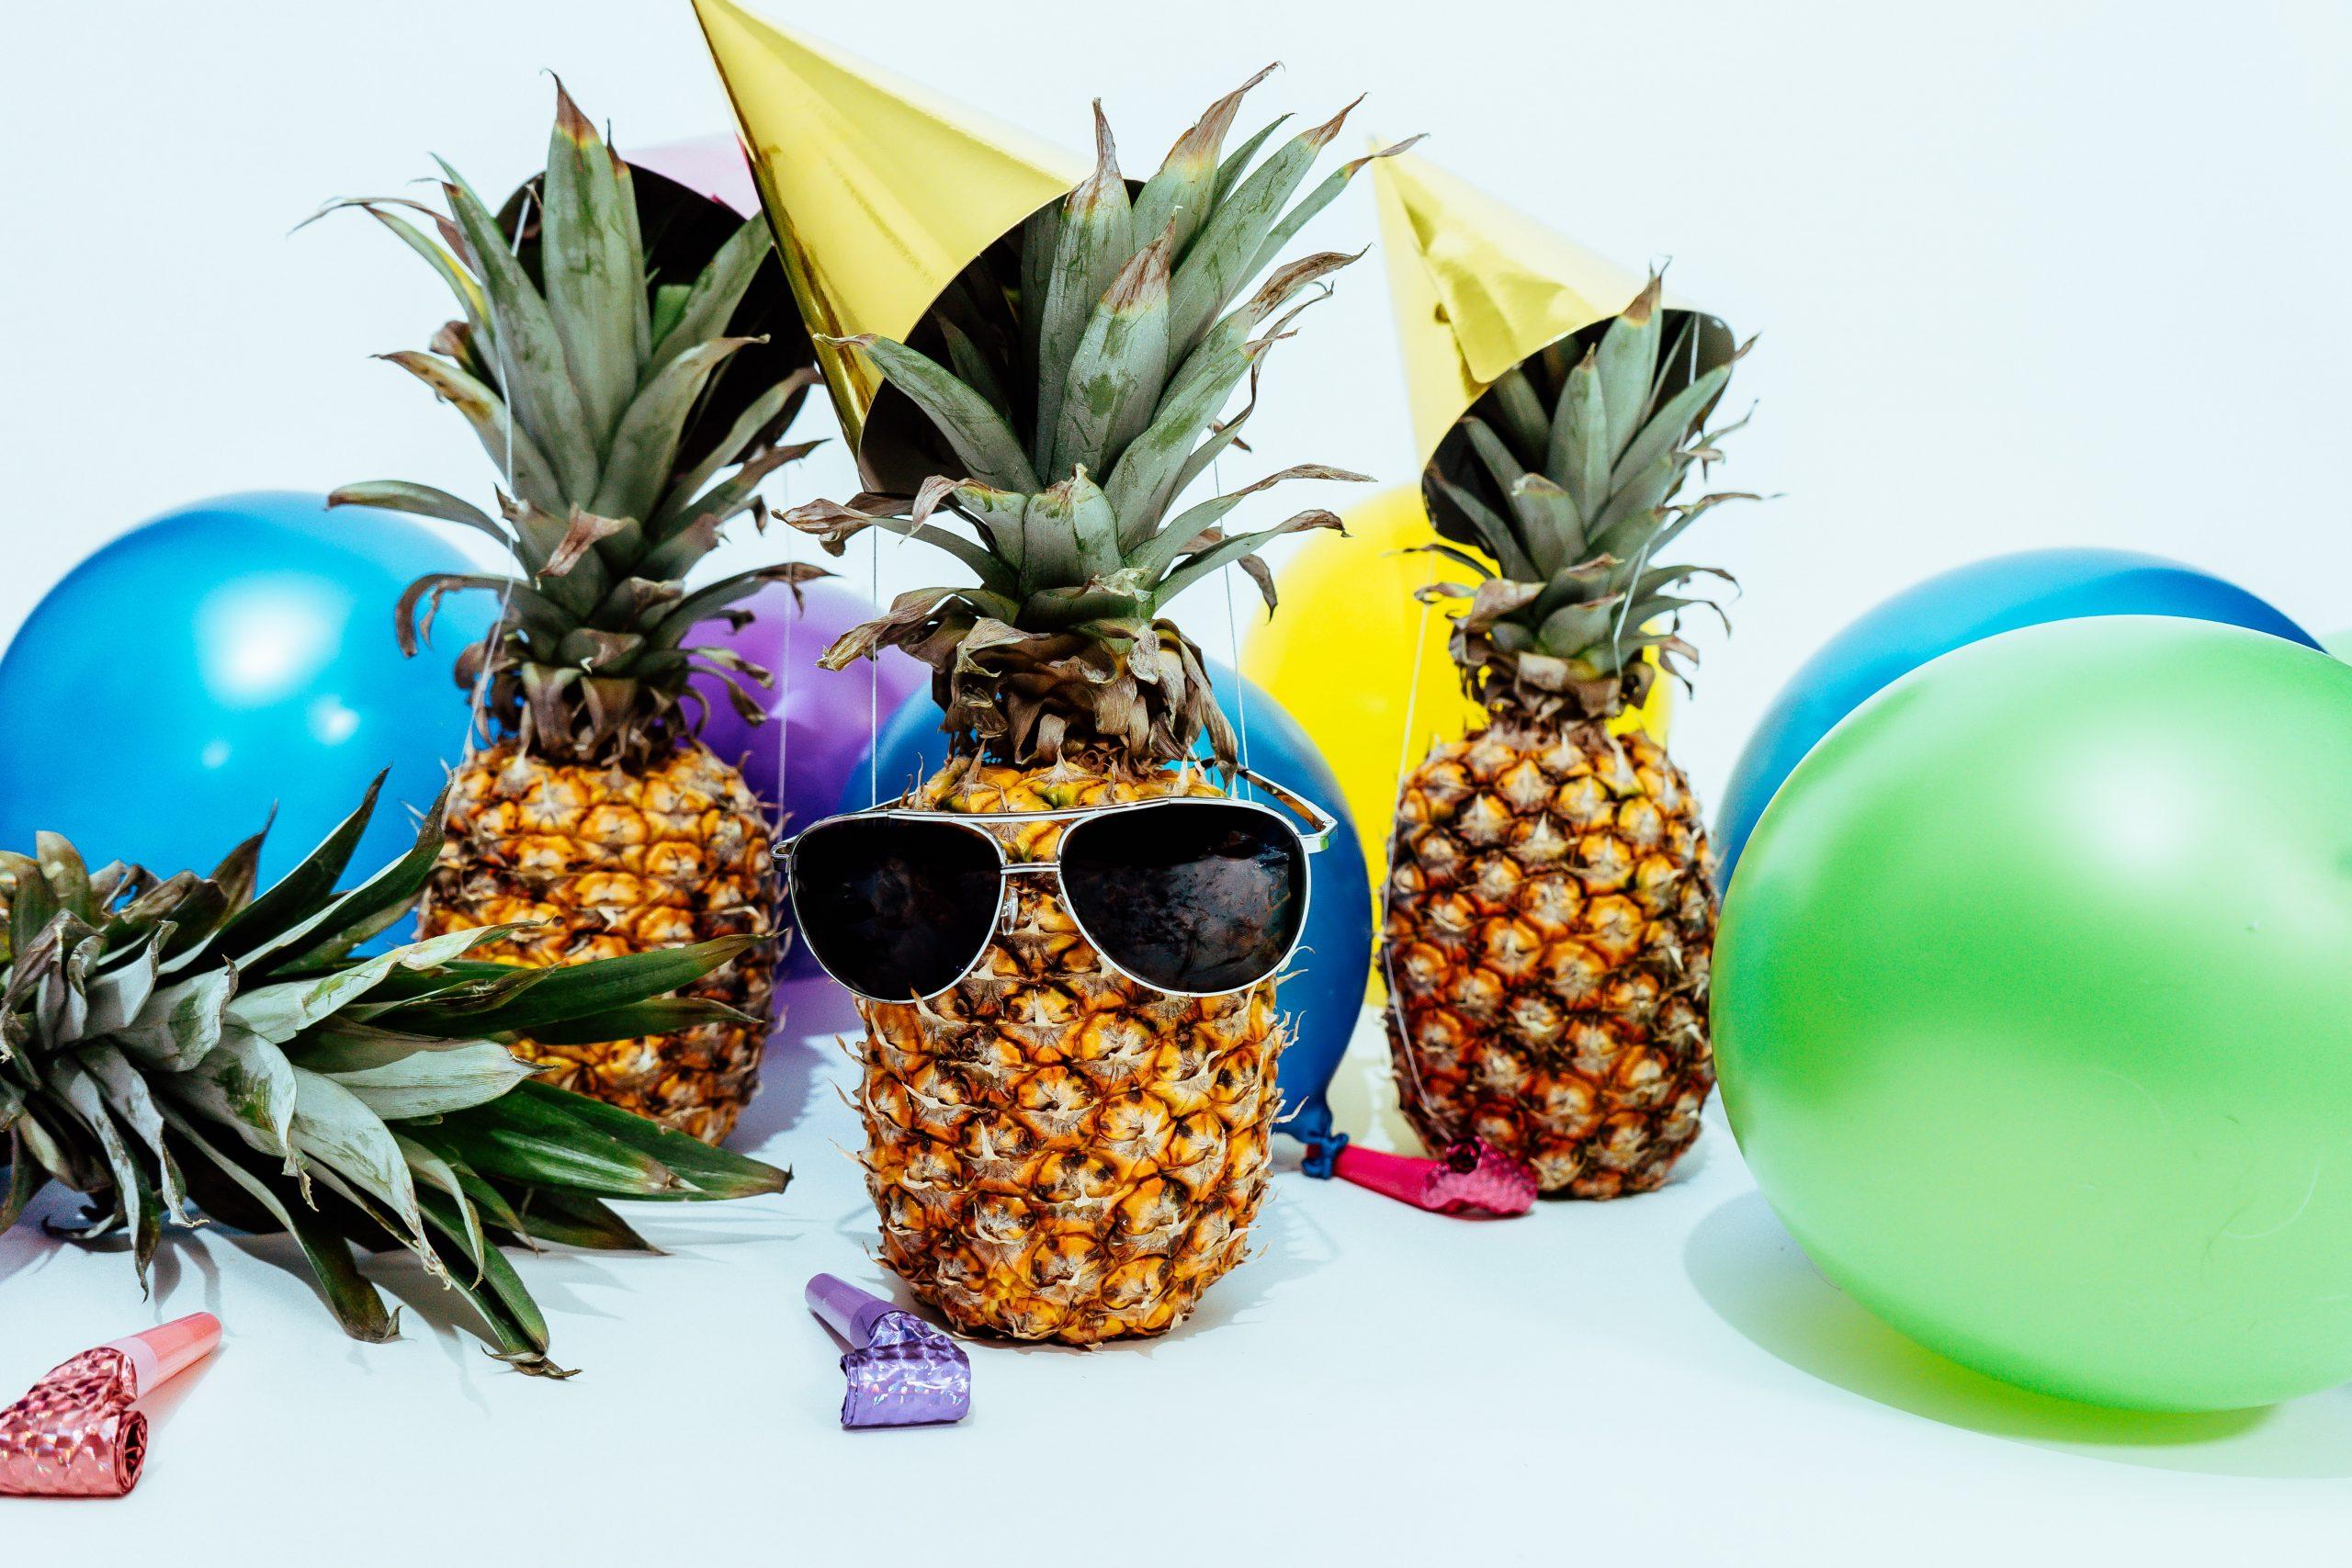 pineapple-supply-co-qWlkCwBnwOE-unsplash-1-scaled.jpg